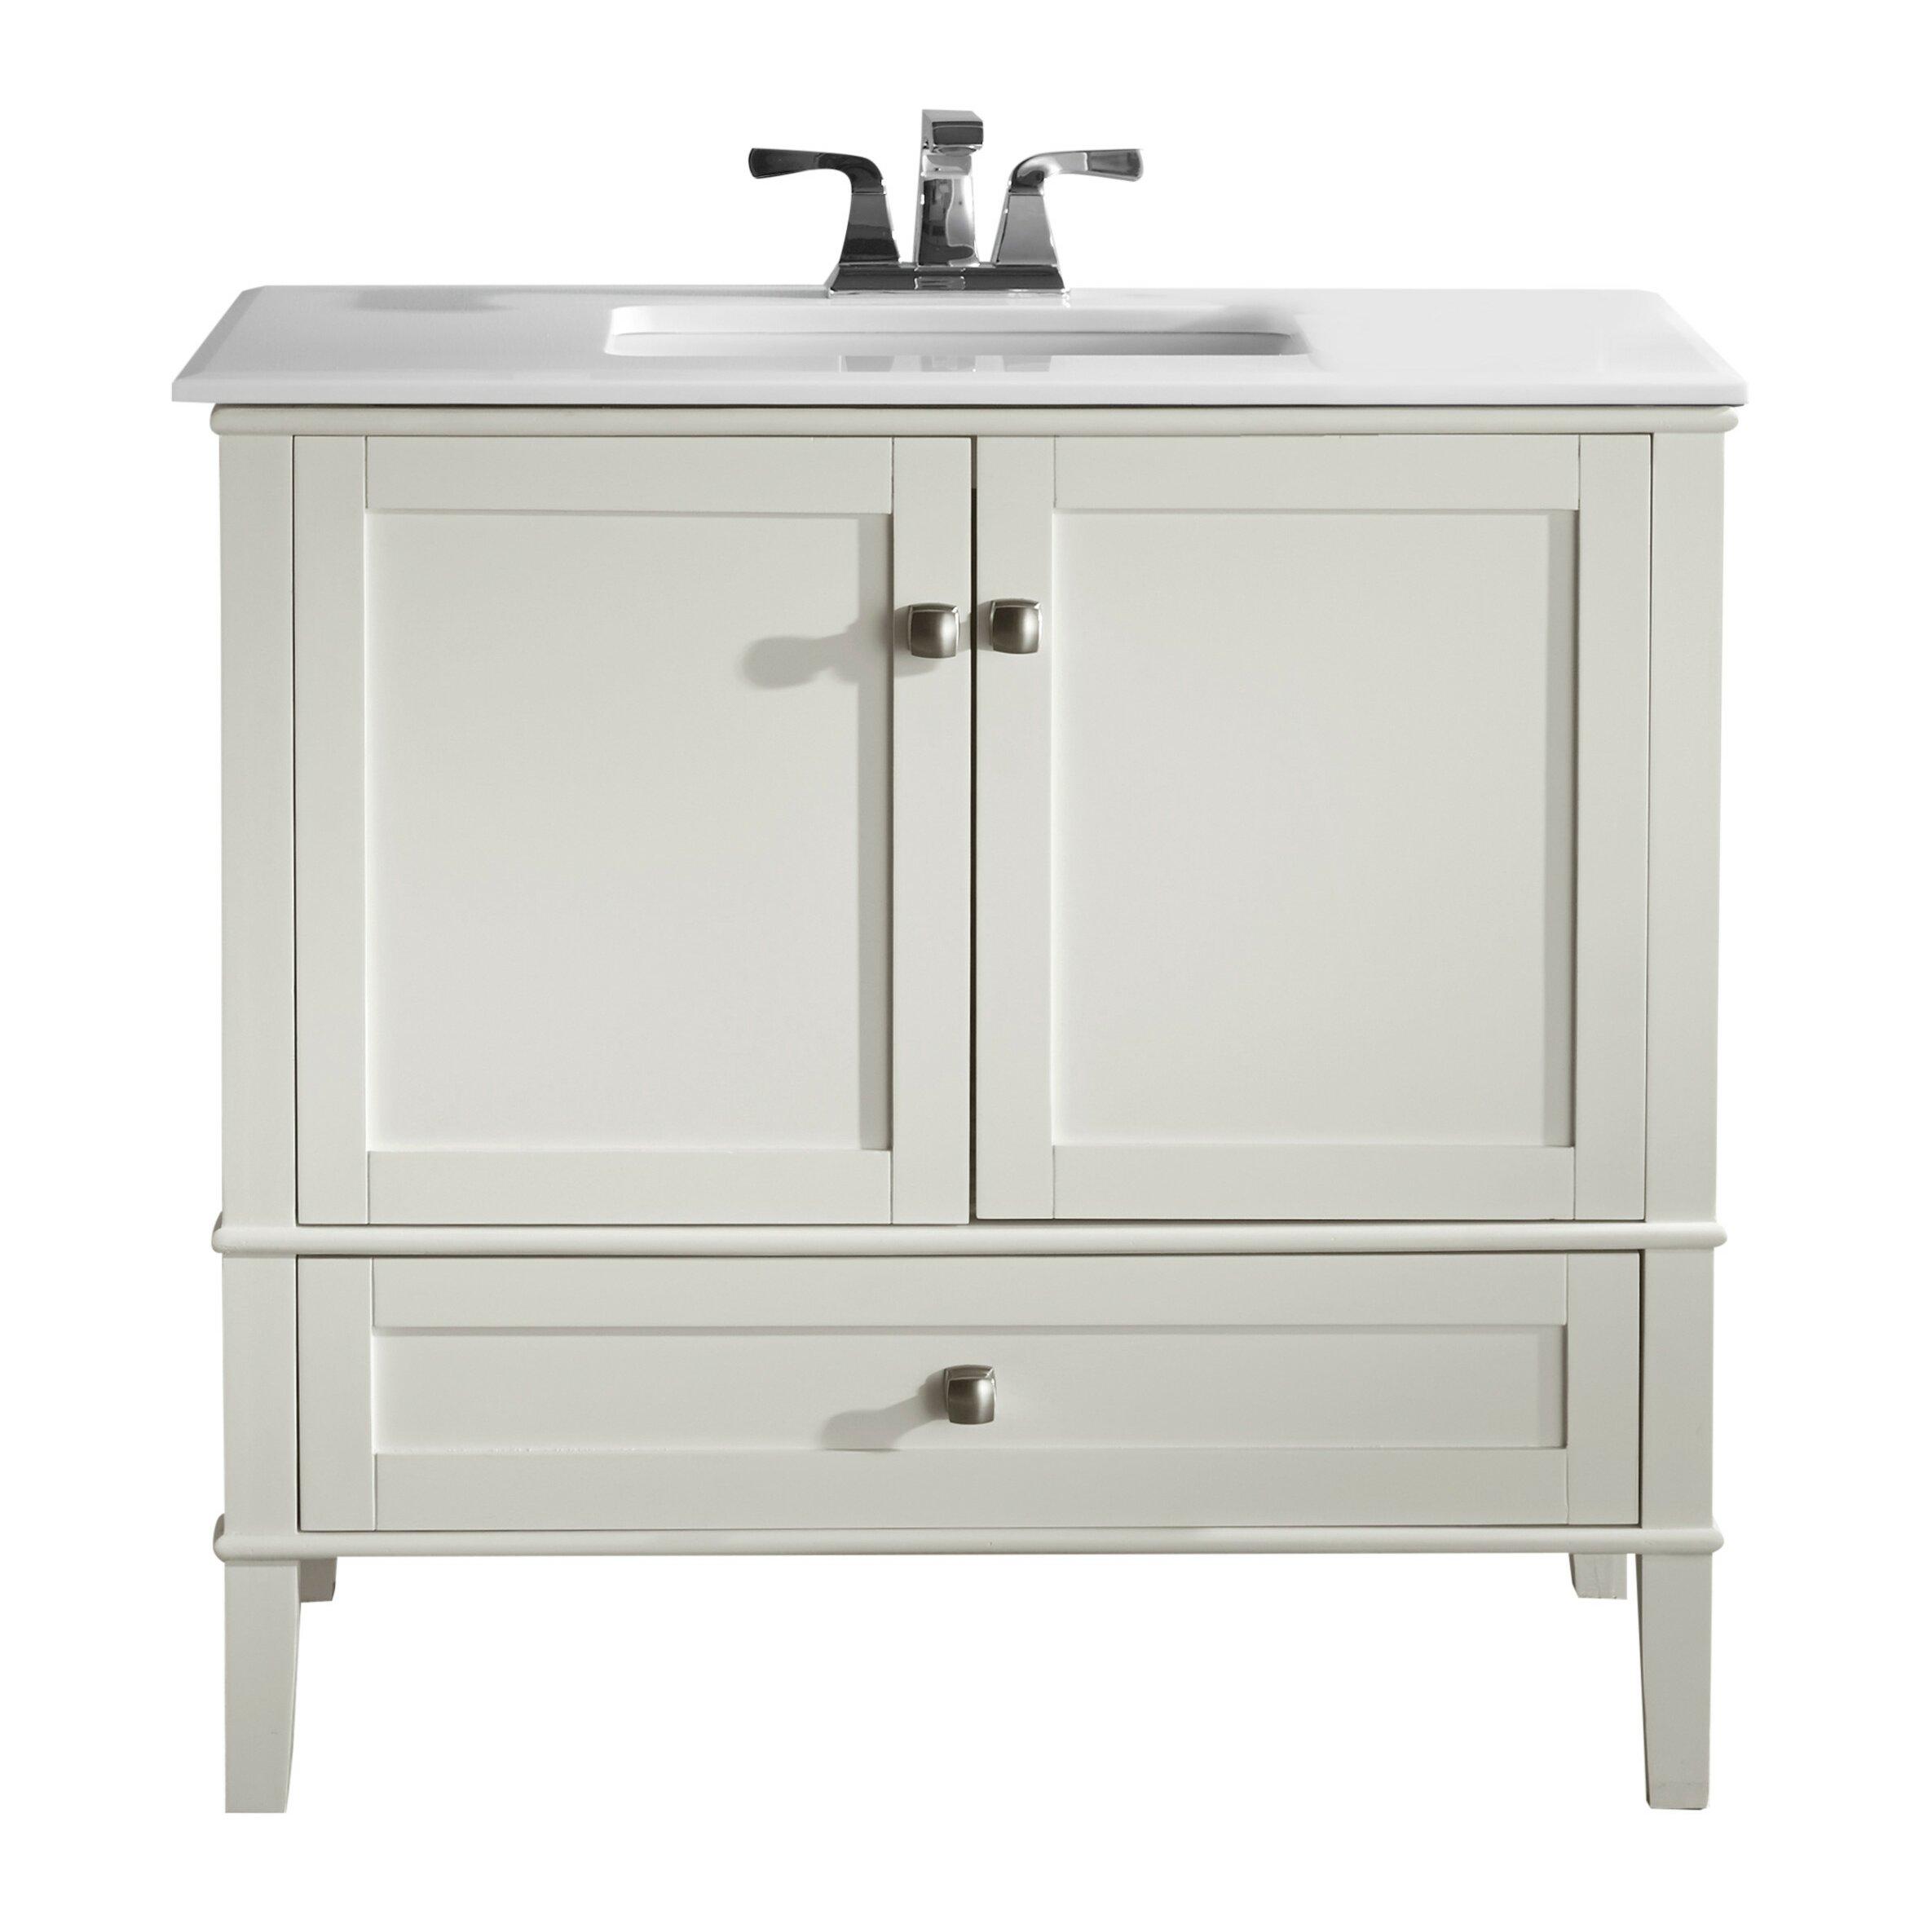 Simpli Home Chelsea 36 quot  Single Bathroom Vanity. Simpli Home Chelsea 36  Single Bathroom Vanity   Reviews   Wayfair